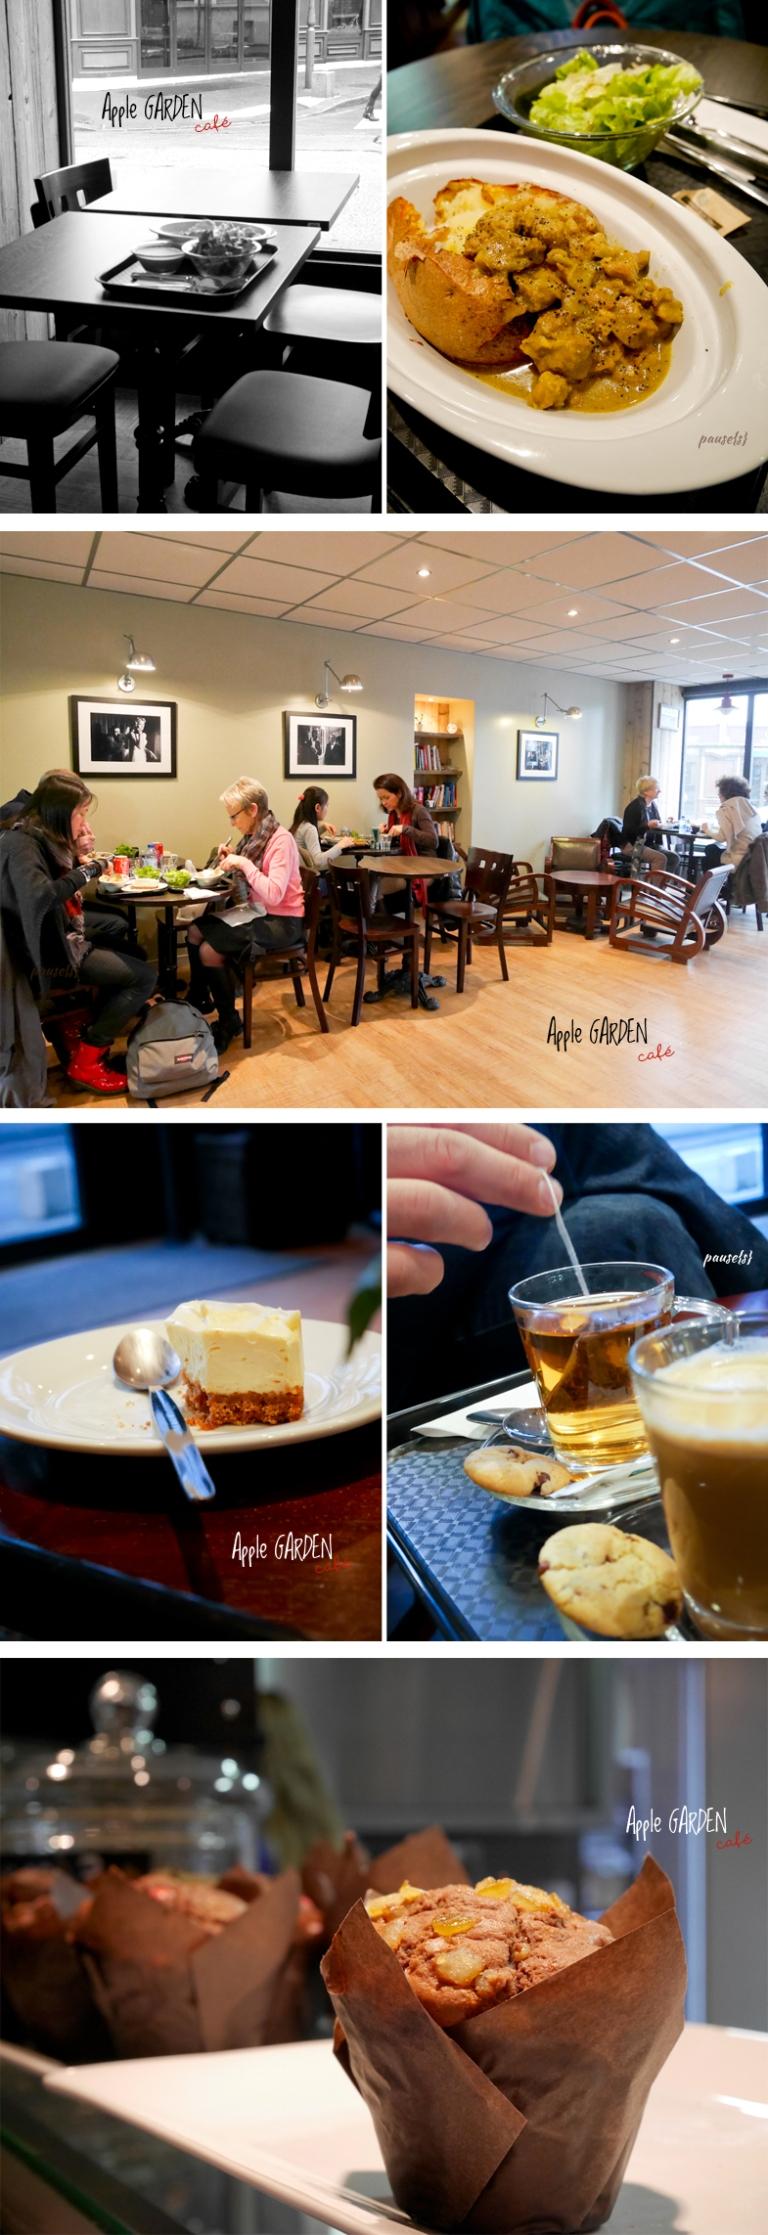 apple-garden-cafe-02